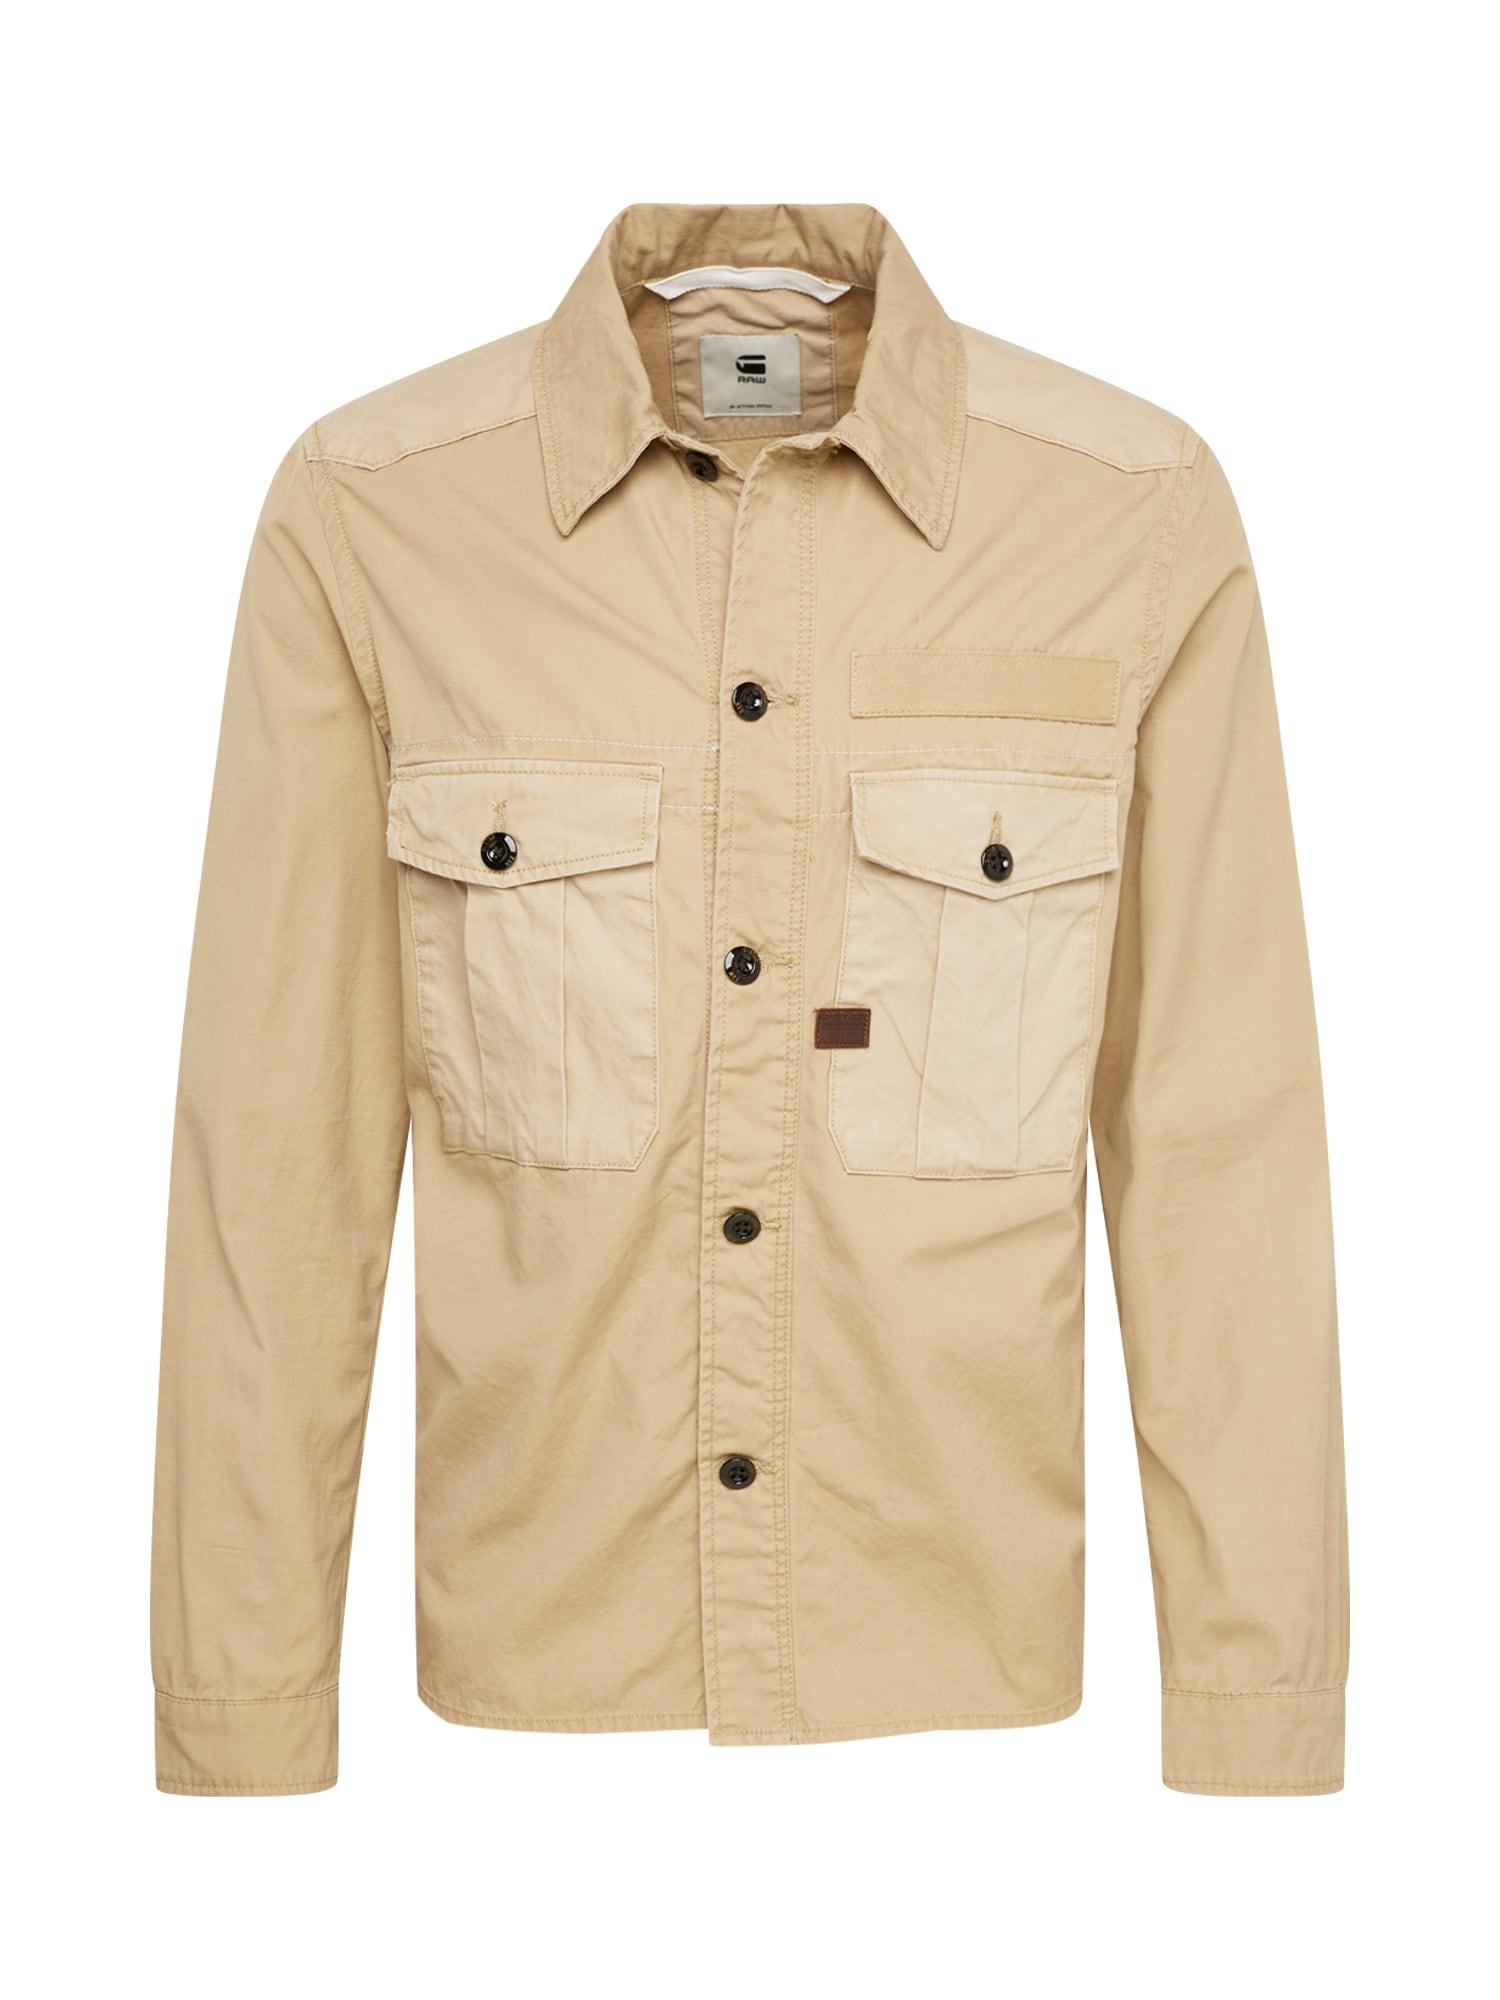 Přechodná bunda Bromid utility straight shirt ls béžová G-STAR RAW